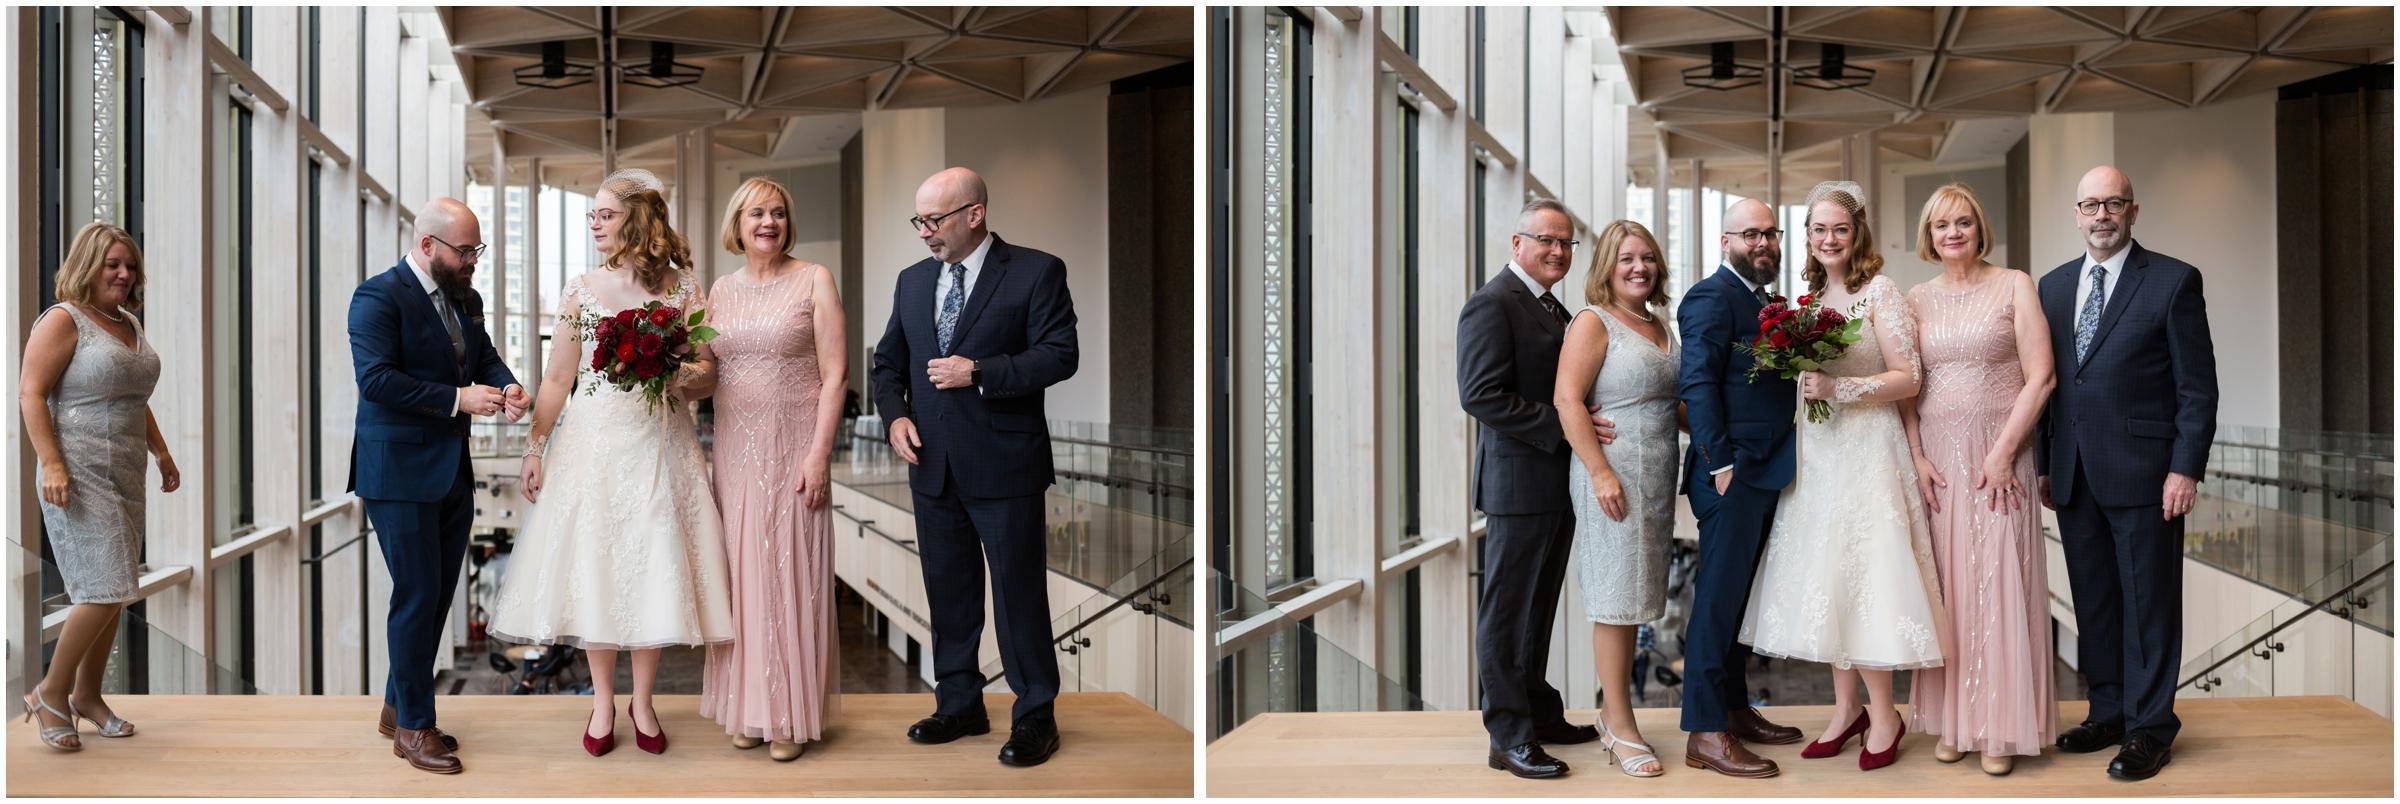 Ottaw Wedding Allison Andrew - (Selena Phillips-Boyle)_0055.jpg